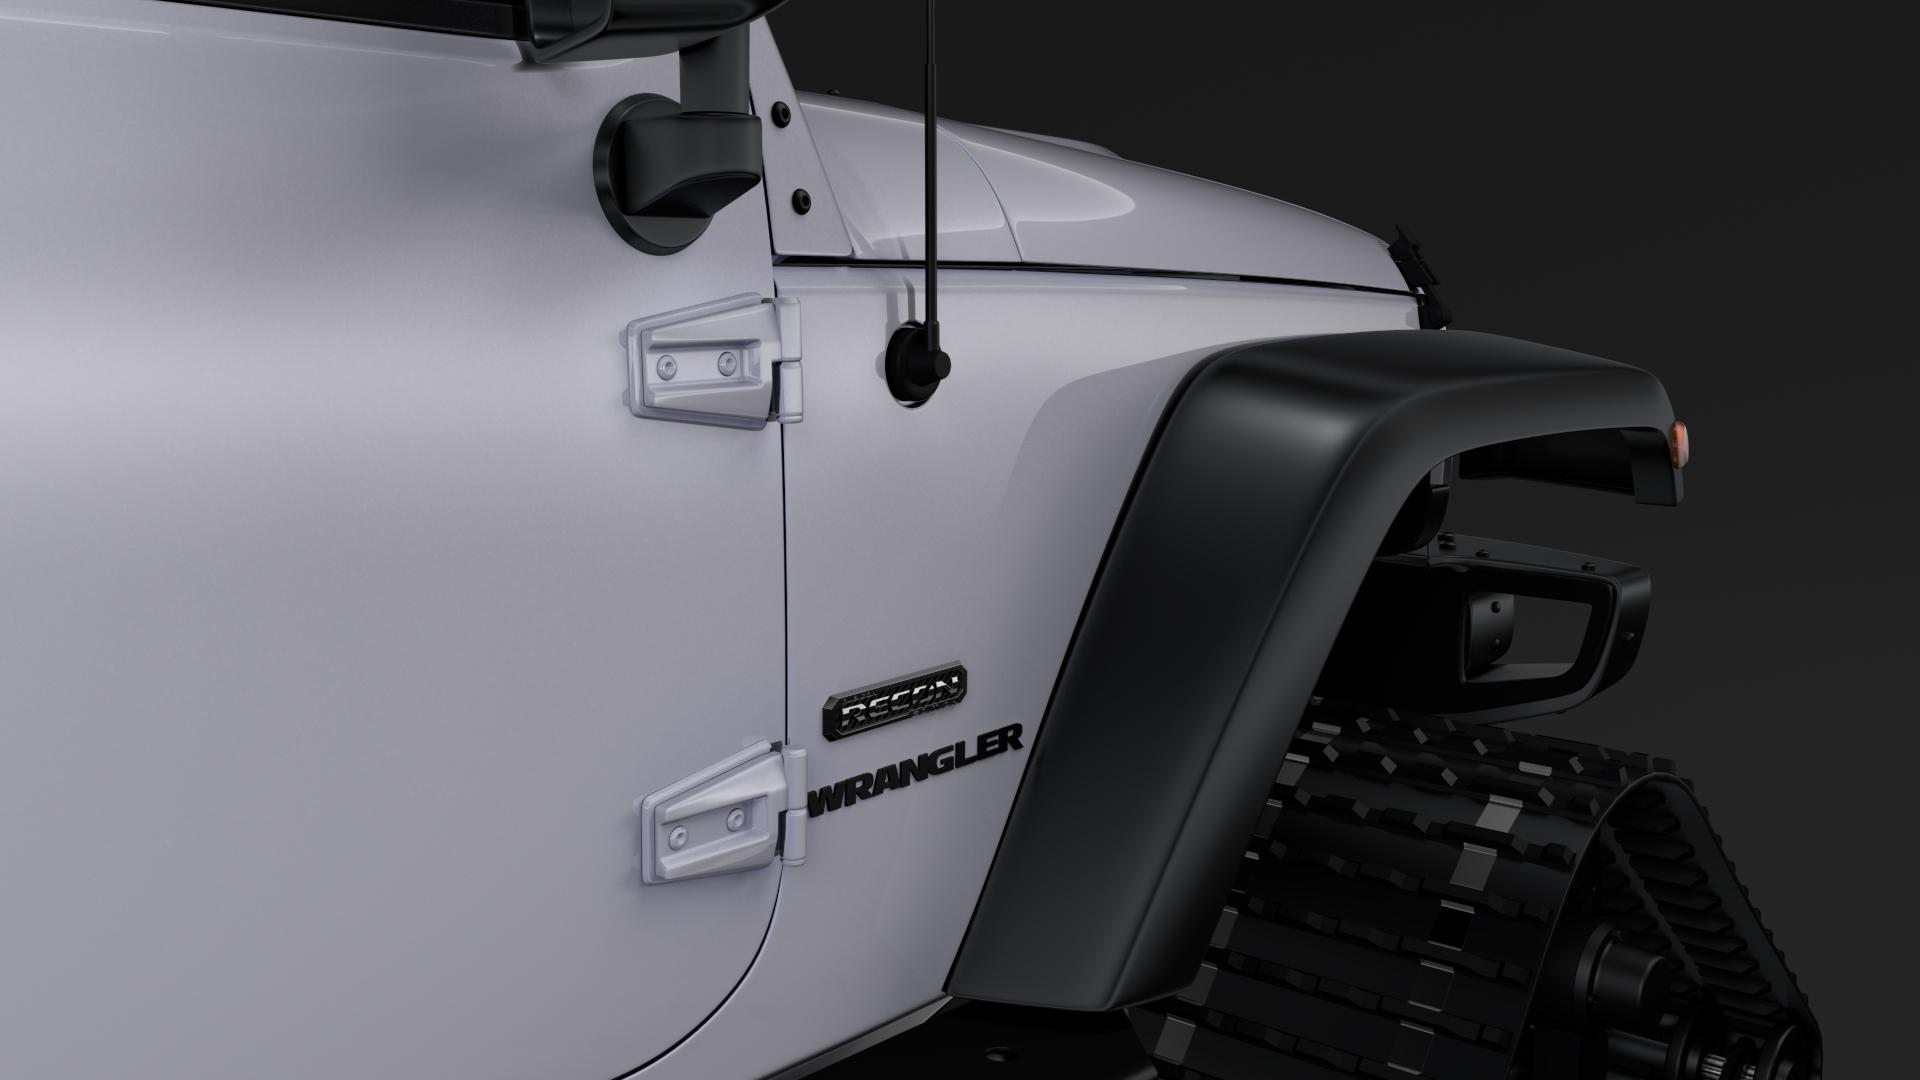 jeep wrangler crawler rubicon recon jk 2017 3d model max fbx c4d lwo ma mb hrc xsi obj 276907